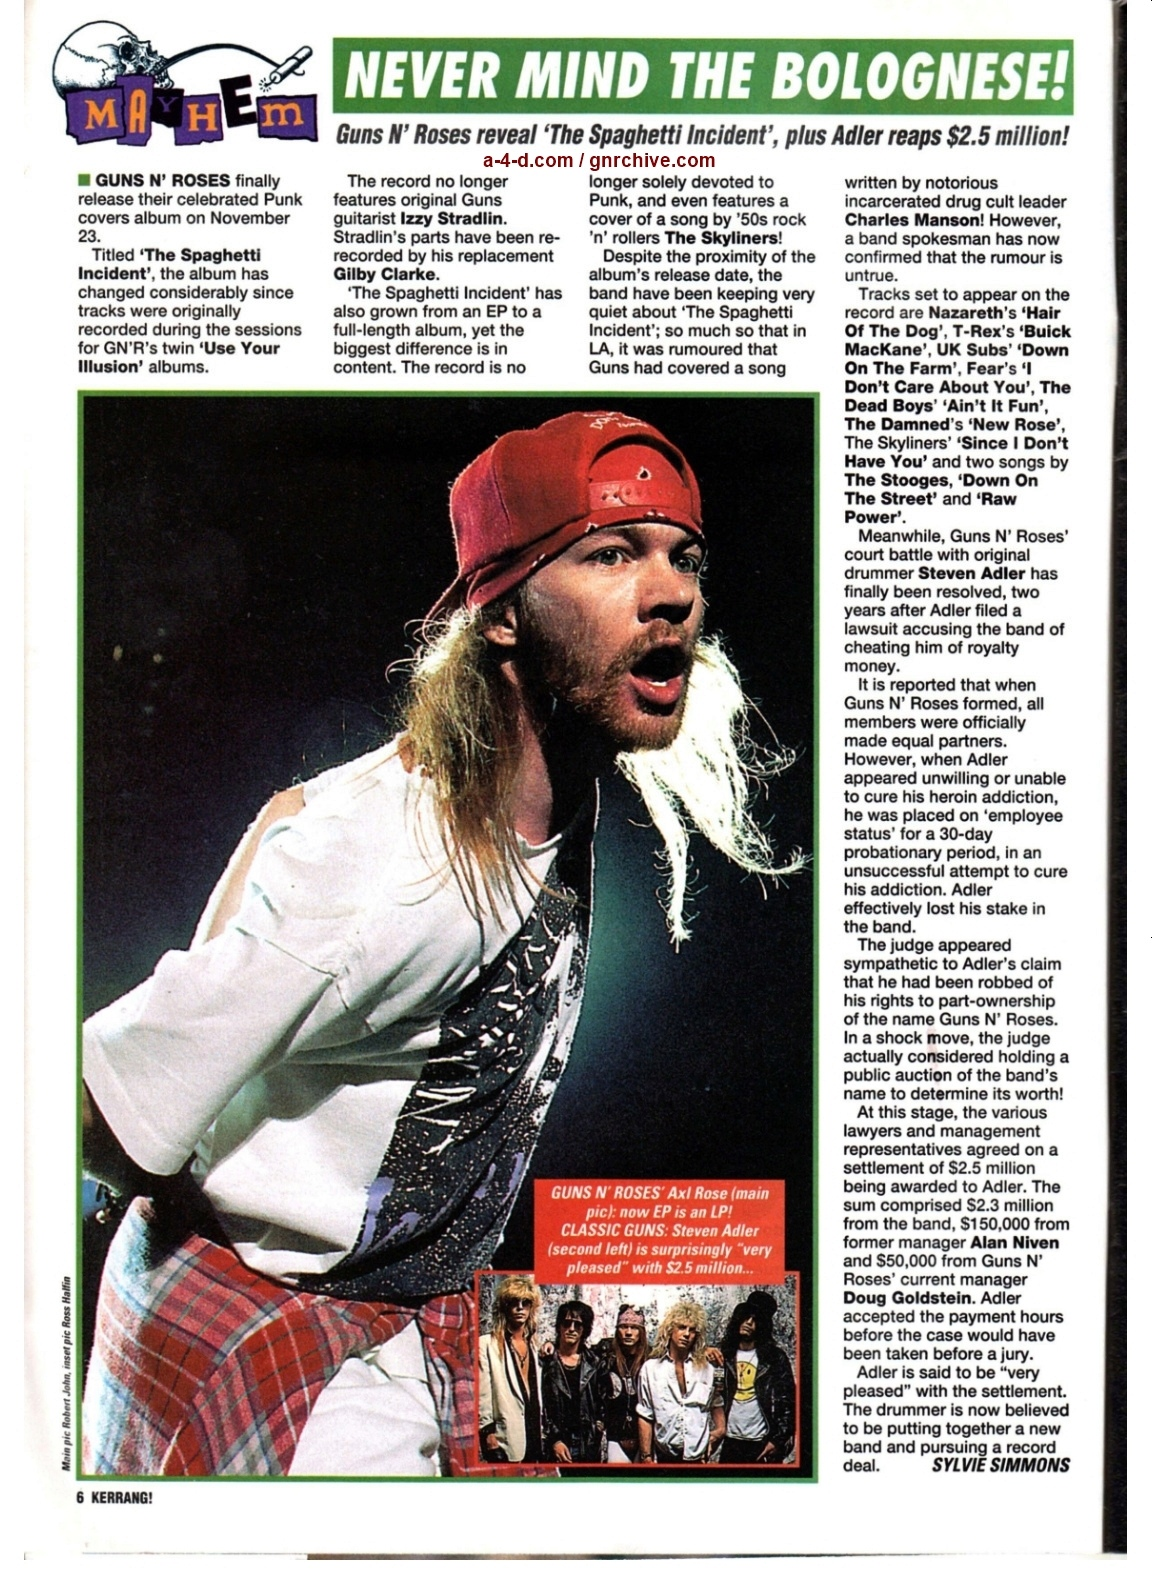 1993.10.16 - Kerrang! - Never Mind The Bolognese! 1993_185